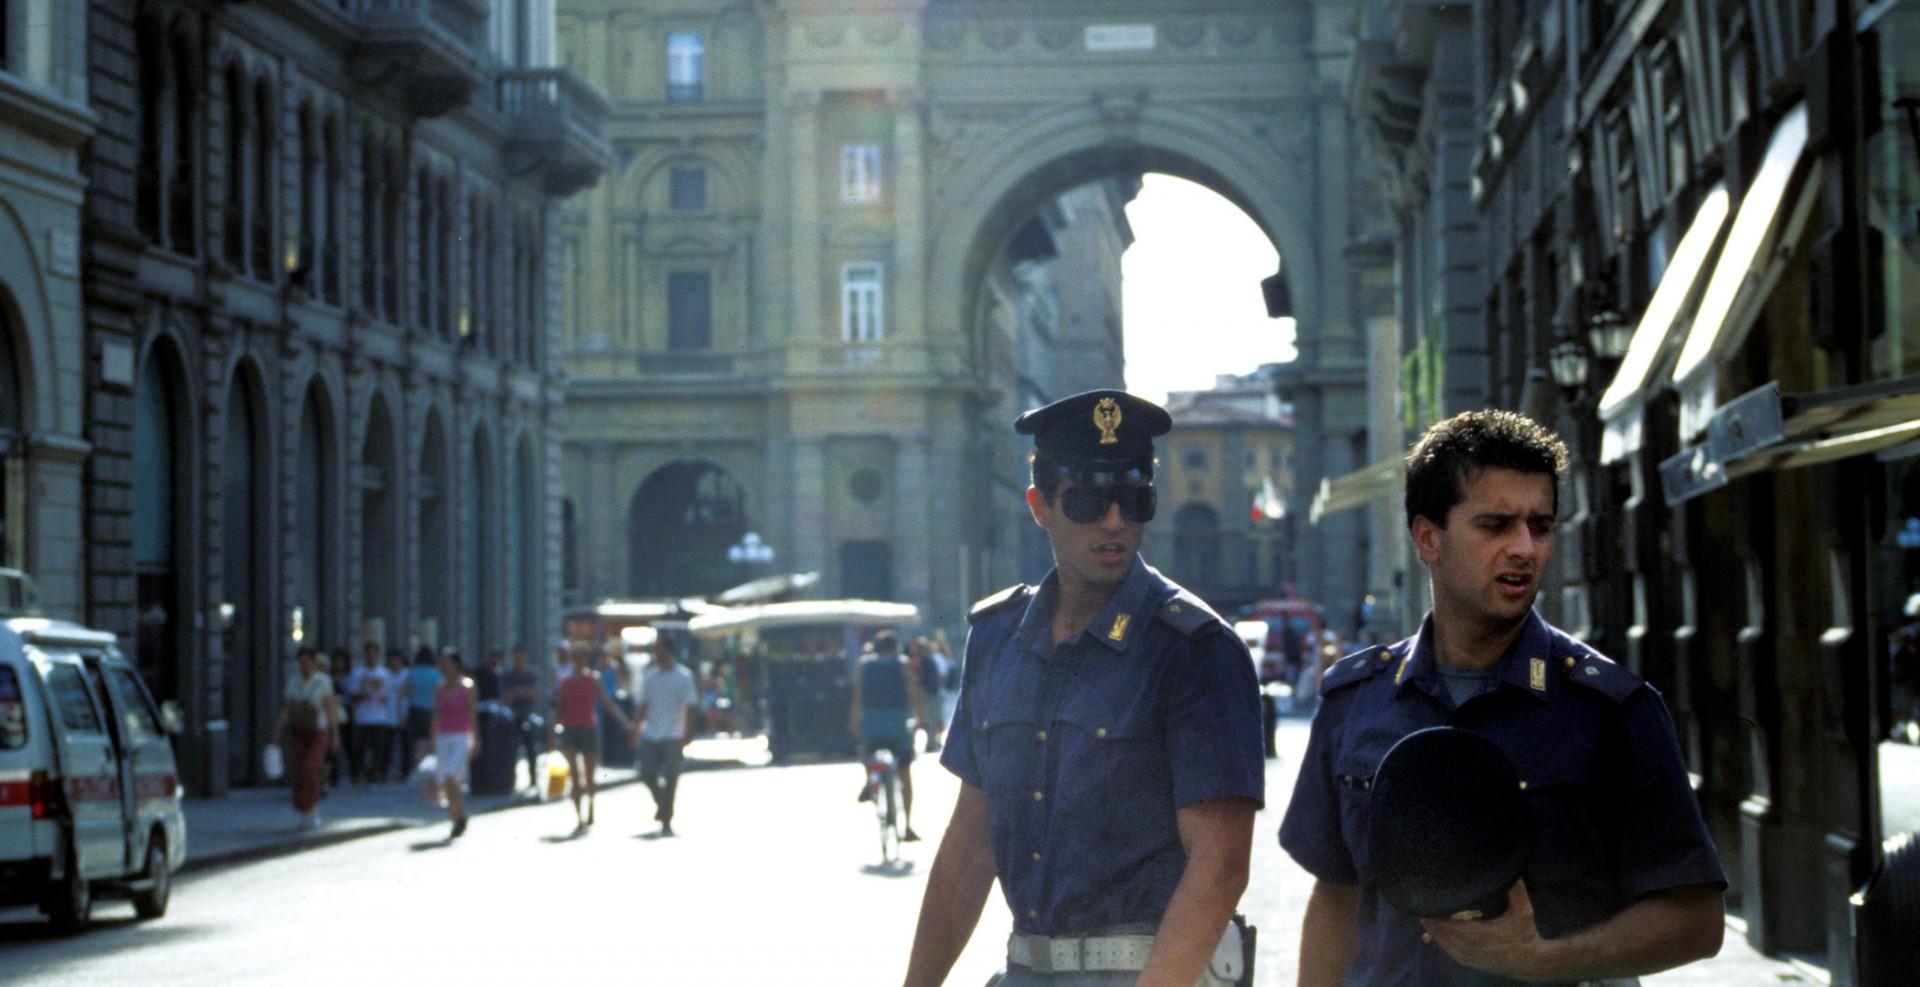 Reportage-Fotograf-in-Paris-Reportage-Fotografie-Mafia-in-Italien